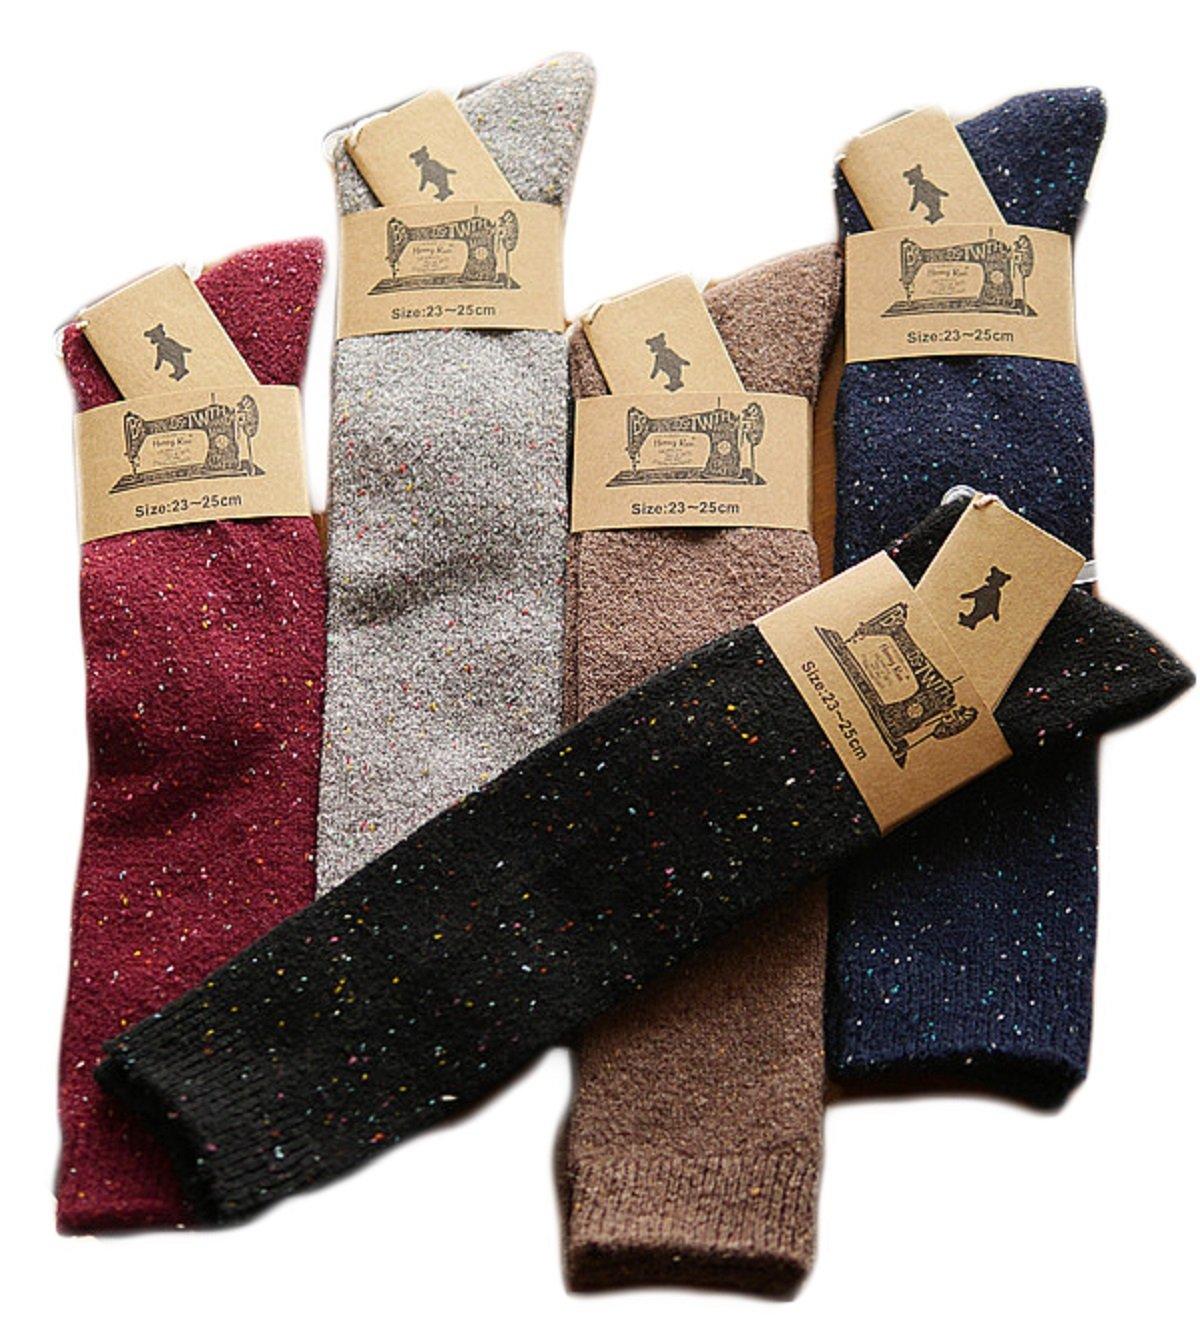 Lian LifeStyle Women's Fashion Knee High Cotton Socks Size 7-9